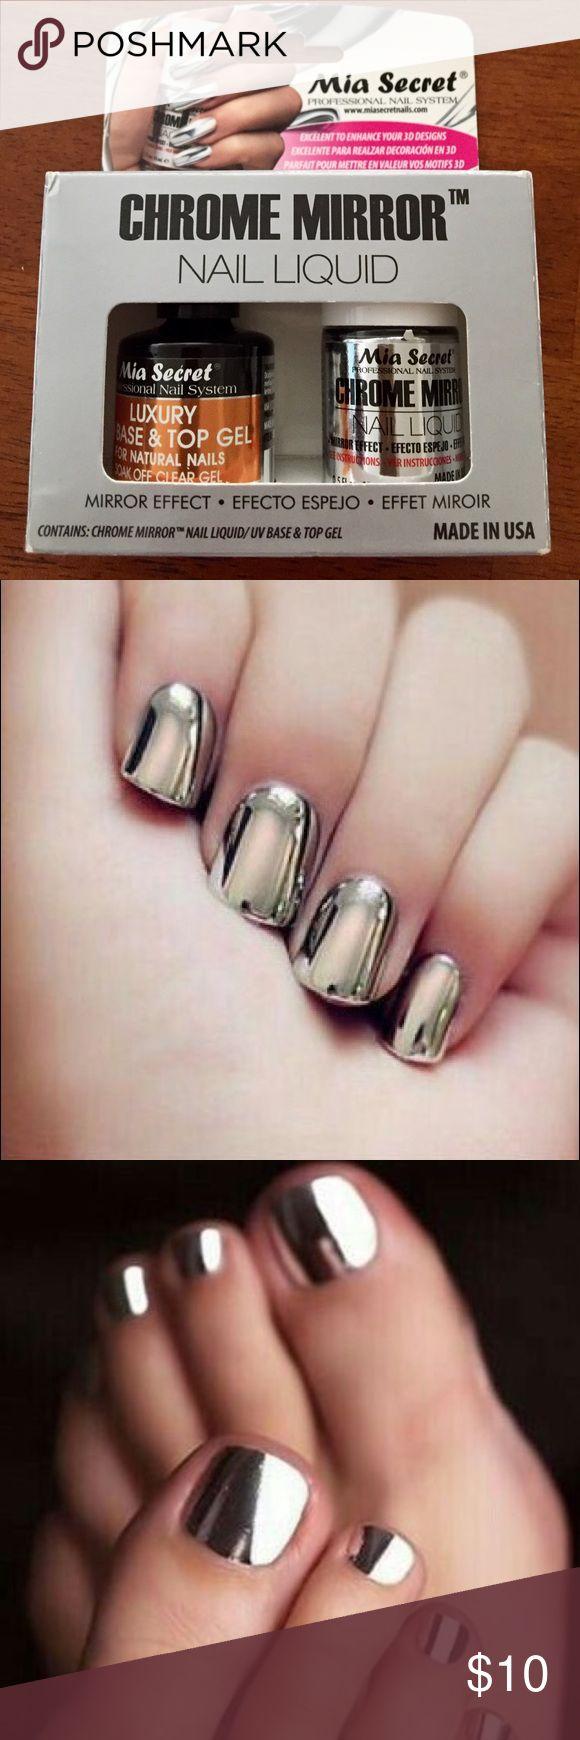 Mia Secret CHROME MIRROR nail polish CHROME MIRROR Nail Liquid. Mia Secret Professional Nail System.  Box contains: Chrome Mirror™ Nail Liquid and Luxury UV Base & Top Gel.  Made in USA  Mai Secret Professional Nail System Other